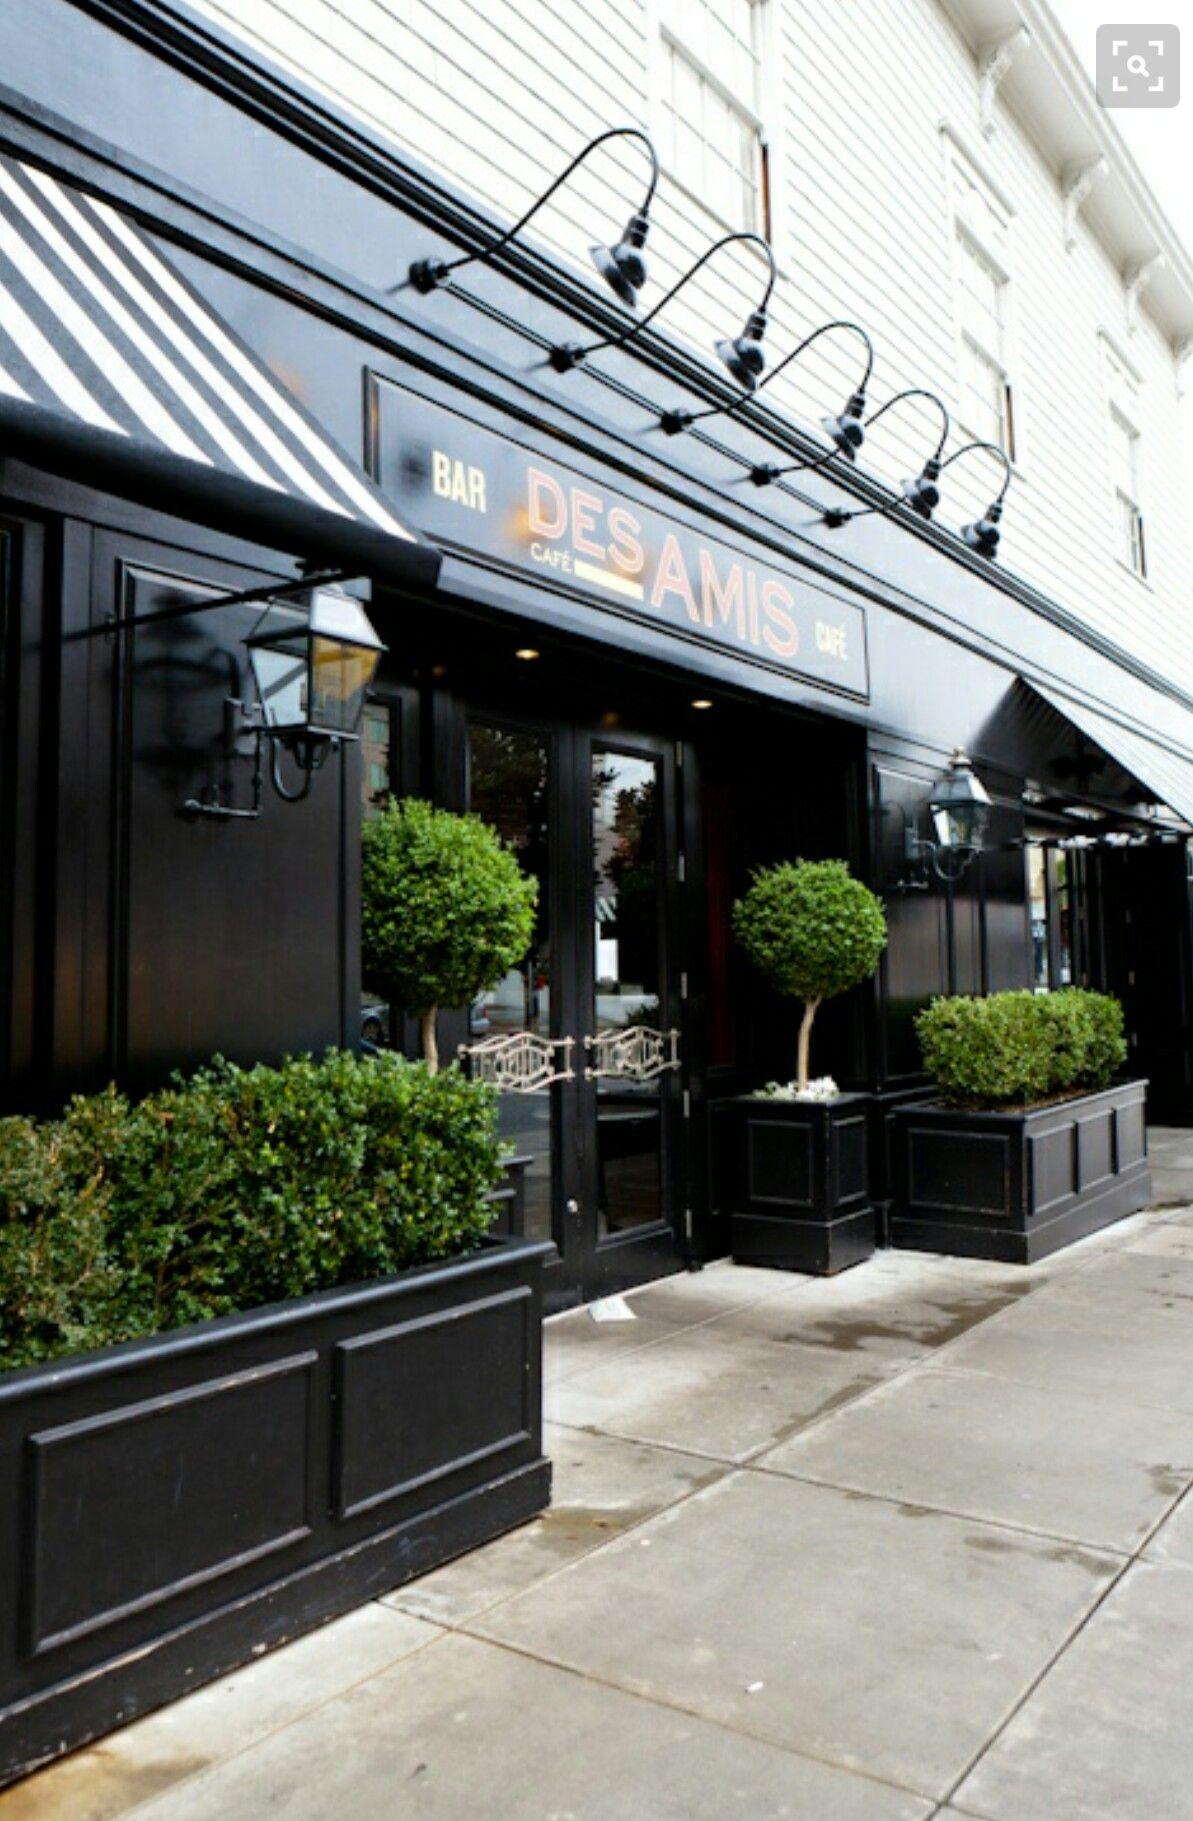 A9a012e23c64844c2f4eb0dc6f81b47e Jpg 1193 1821 Cafe Exterior Restaurant Exterior Coffee Shops Interior